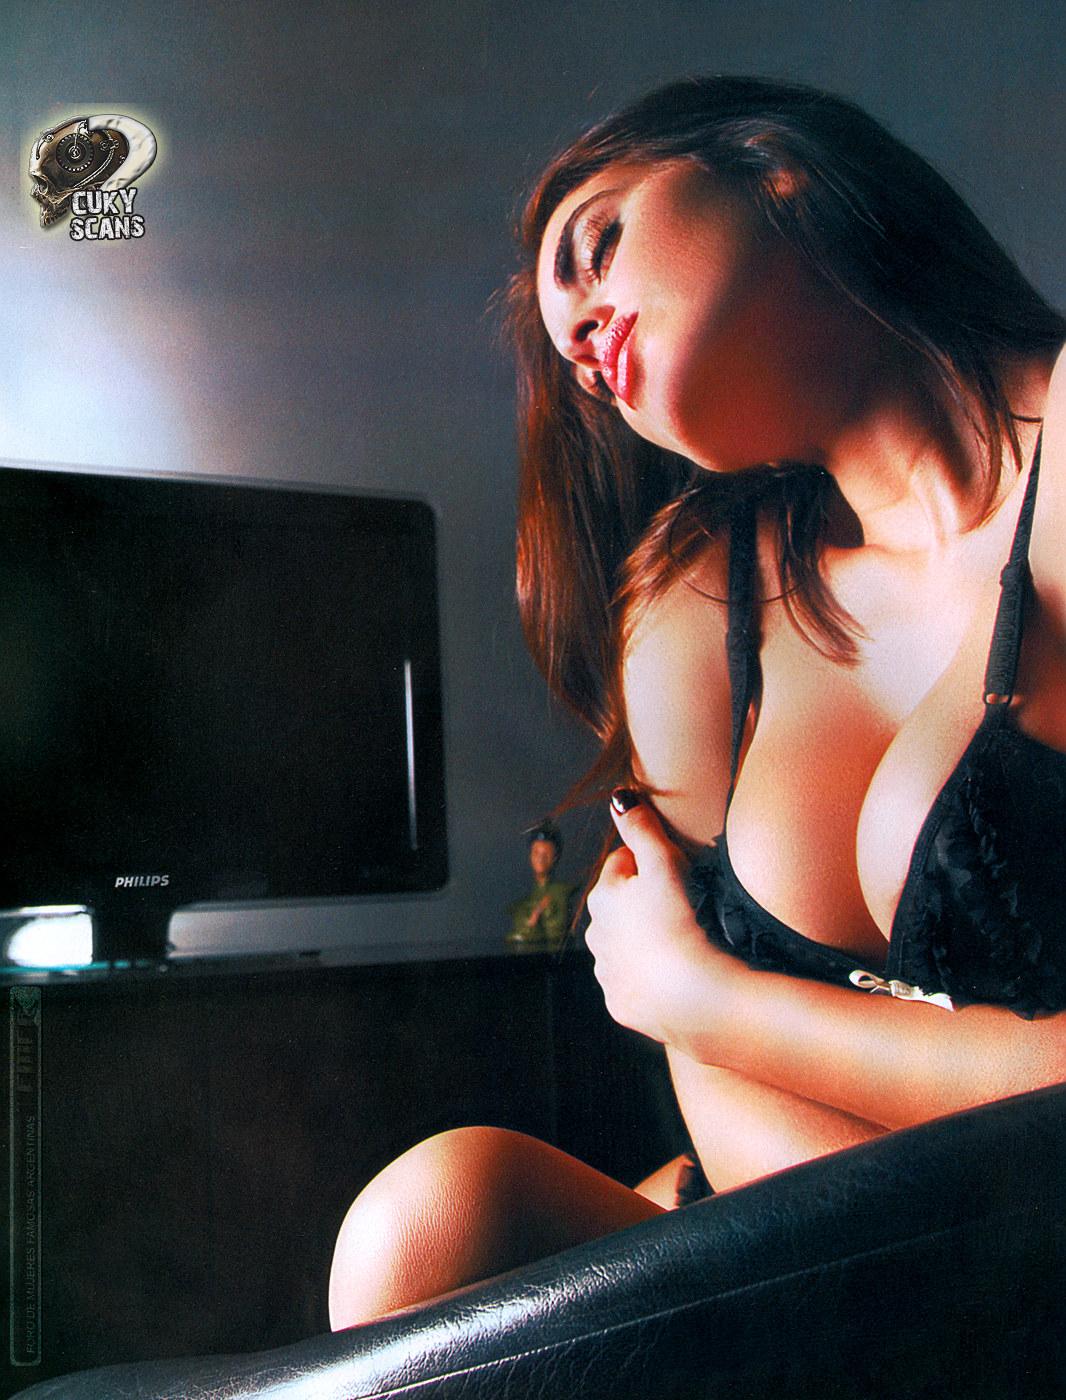 http://3.bp.blogspot.com/_8lmC2ddrRnM/SwyDRSzjv4I/AAAAAAAABqg/XQXmUPHeMSI/s1600/Silvina+Luna4.JPG